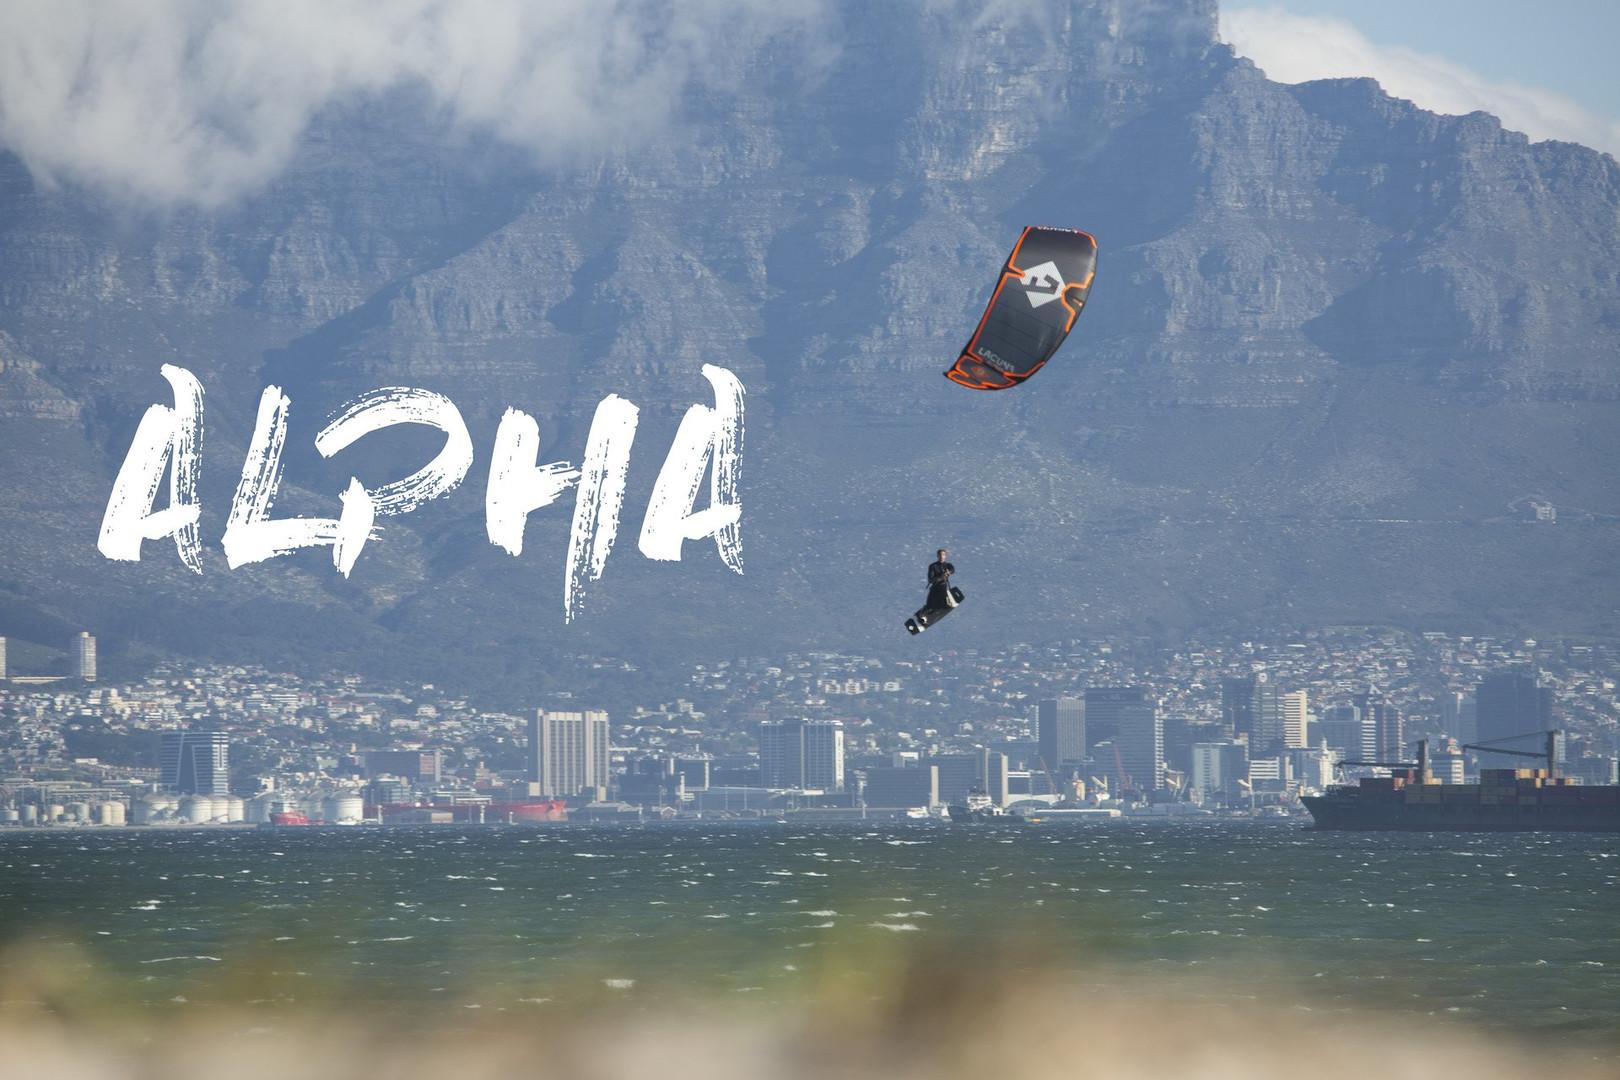 Lacuna_Kites_-_Alpha.jpg